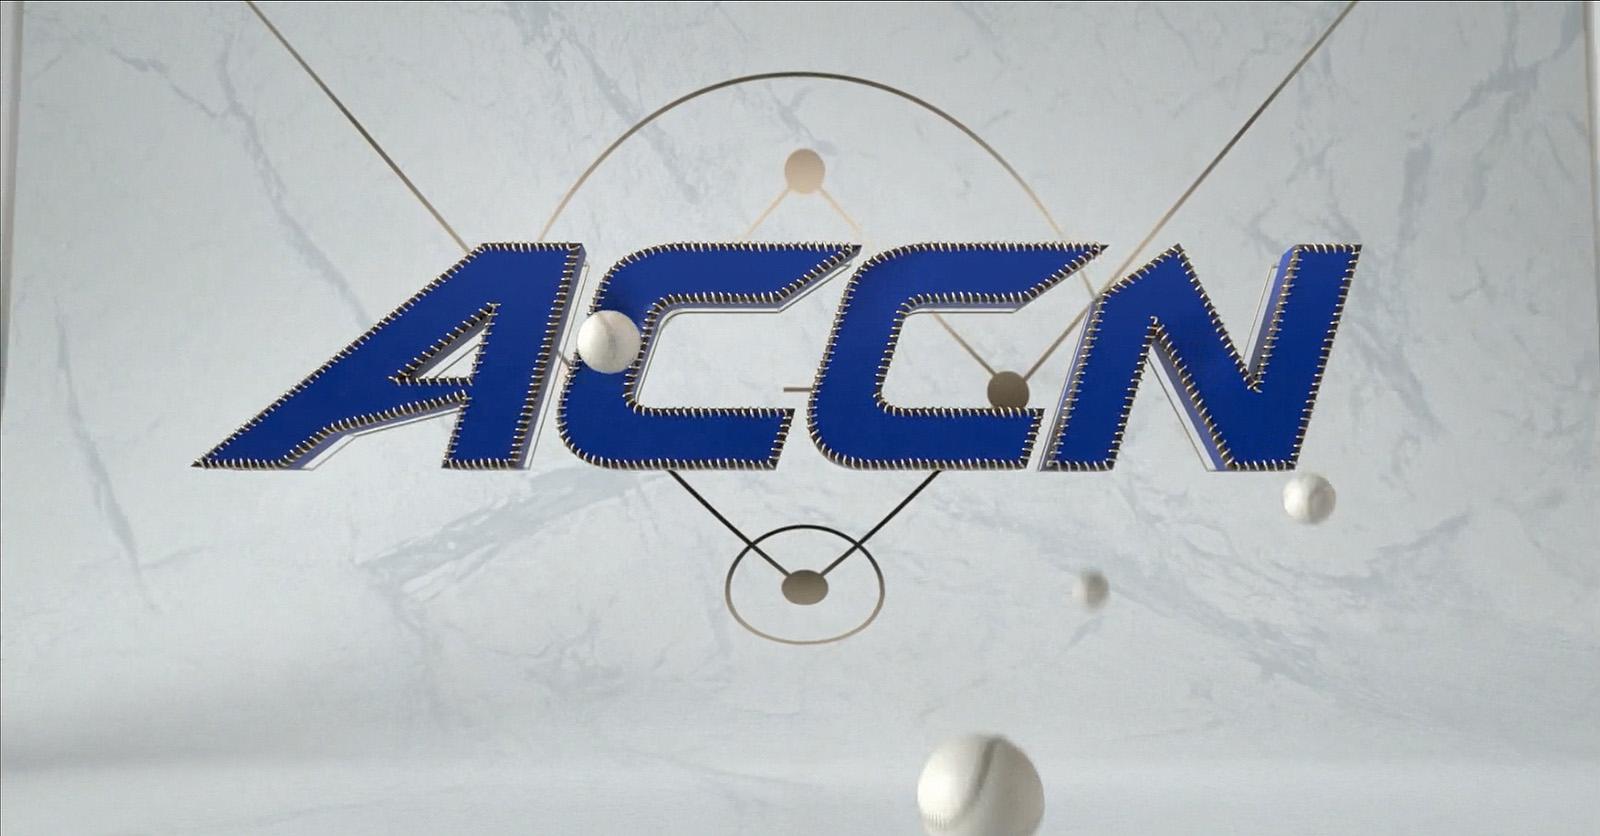 NCS_ACC-Network_Troika_ESPN_040